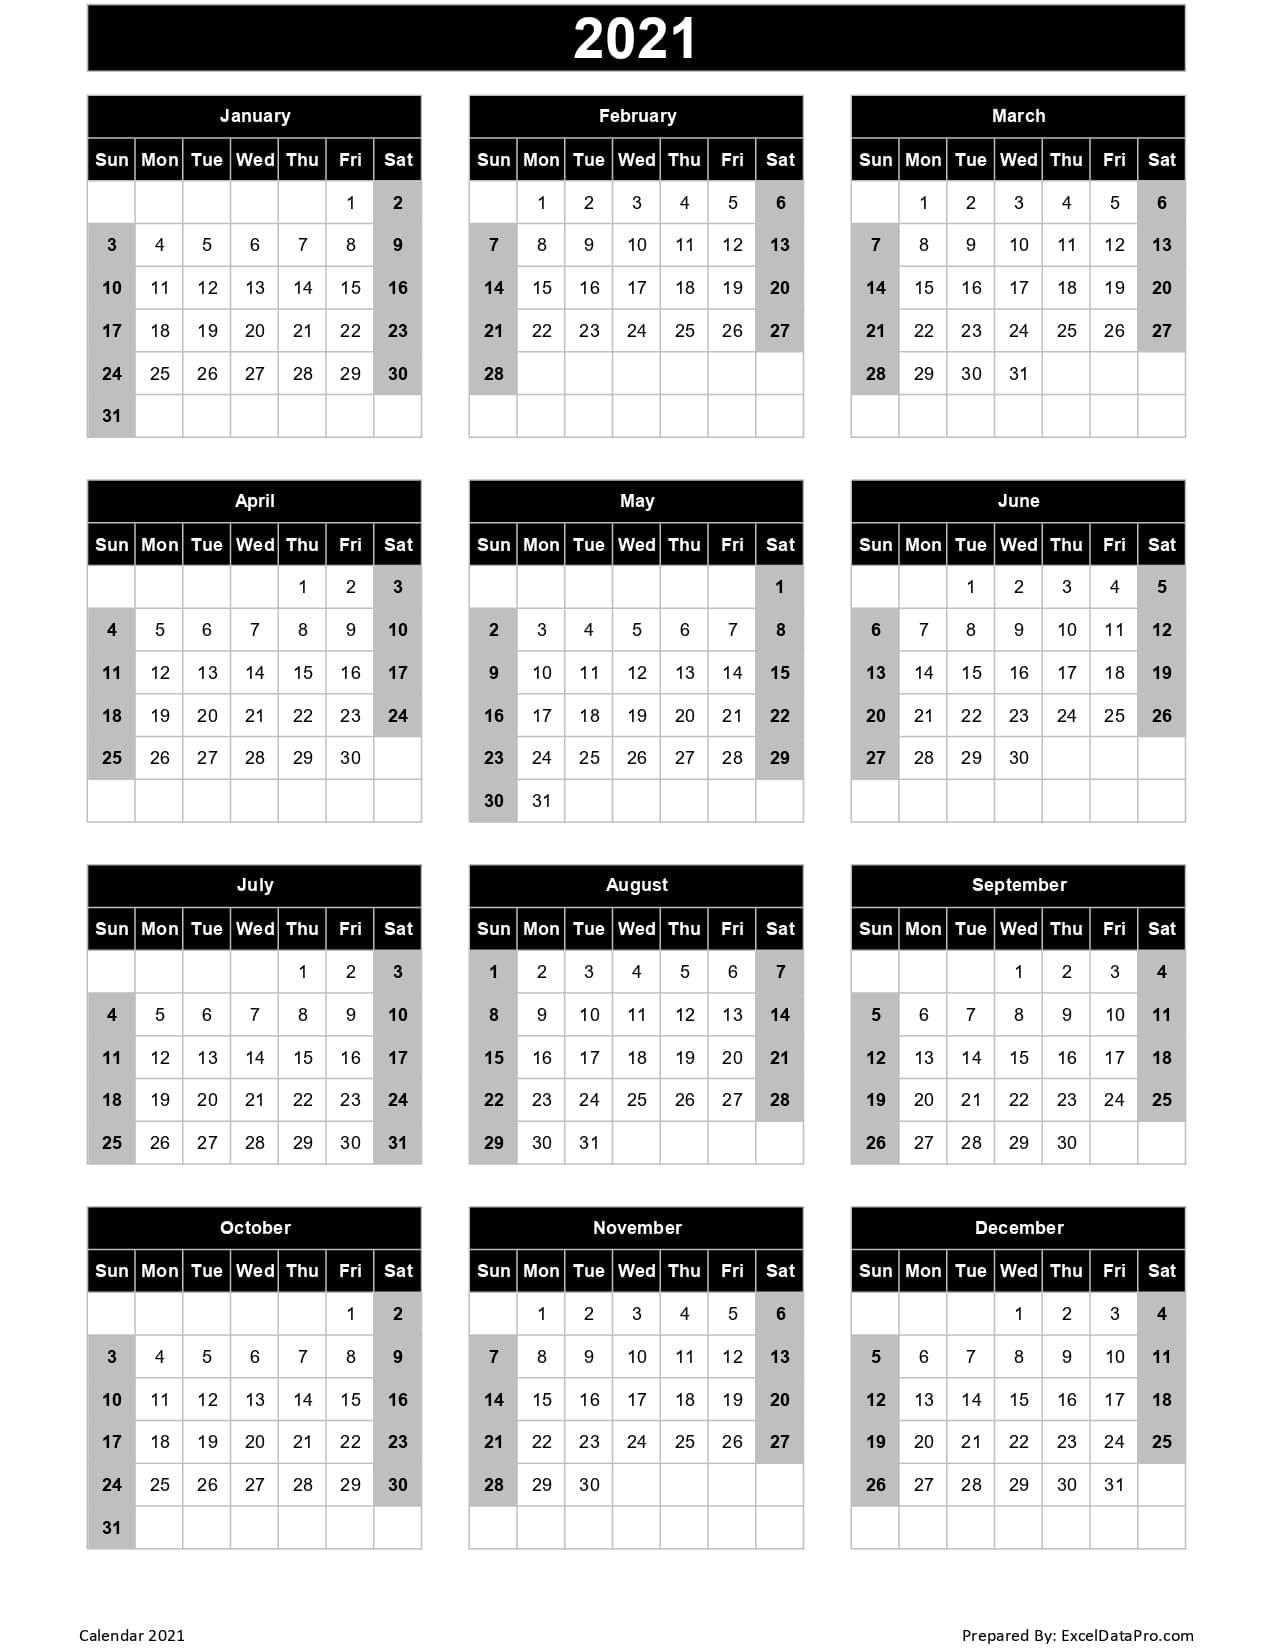 Calendar 2021 Excel Templates Printable Pdfs Images